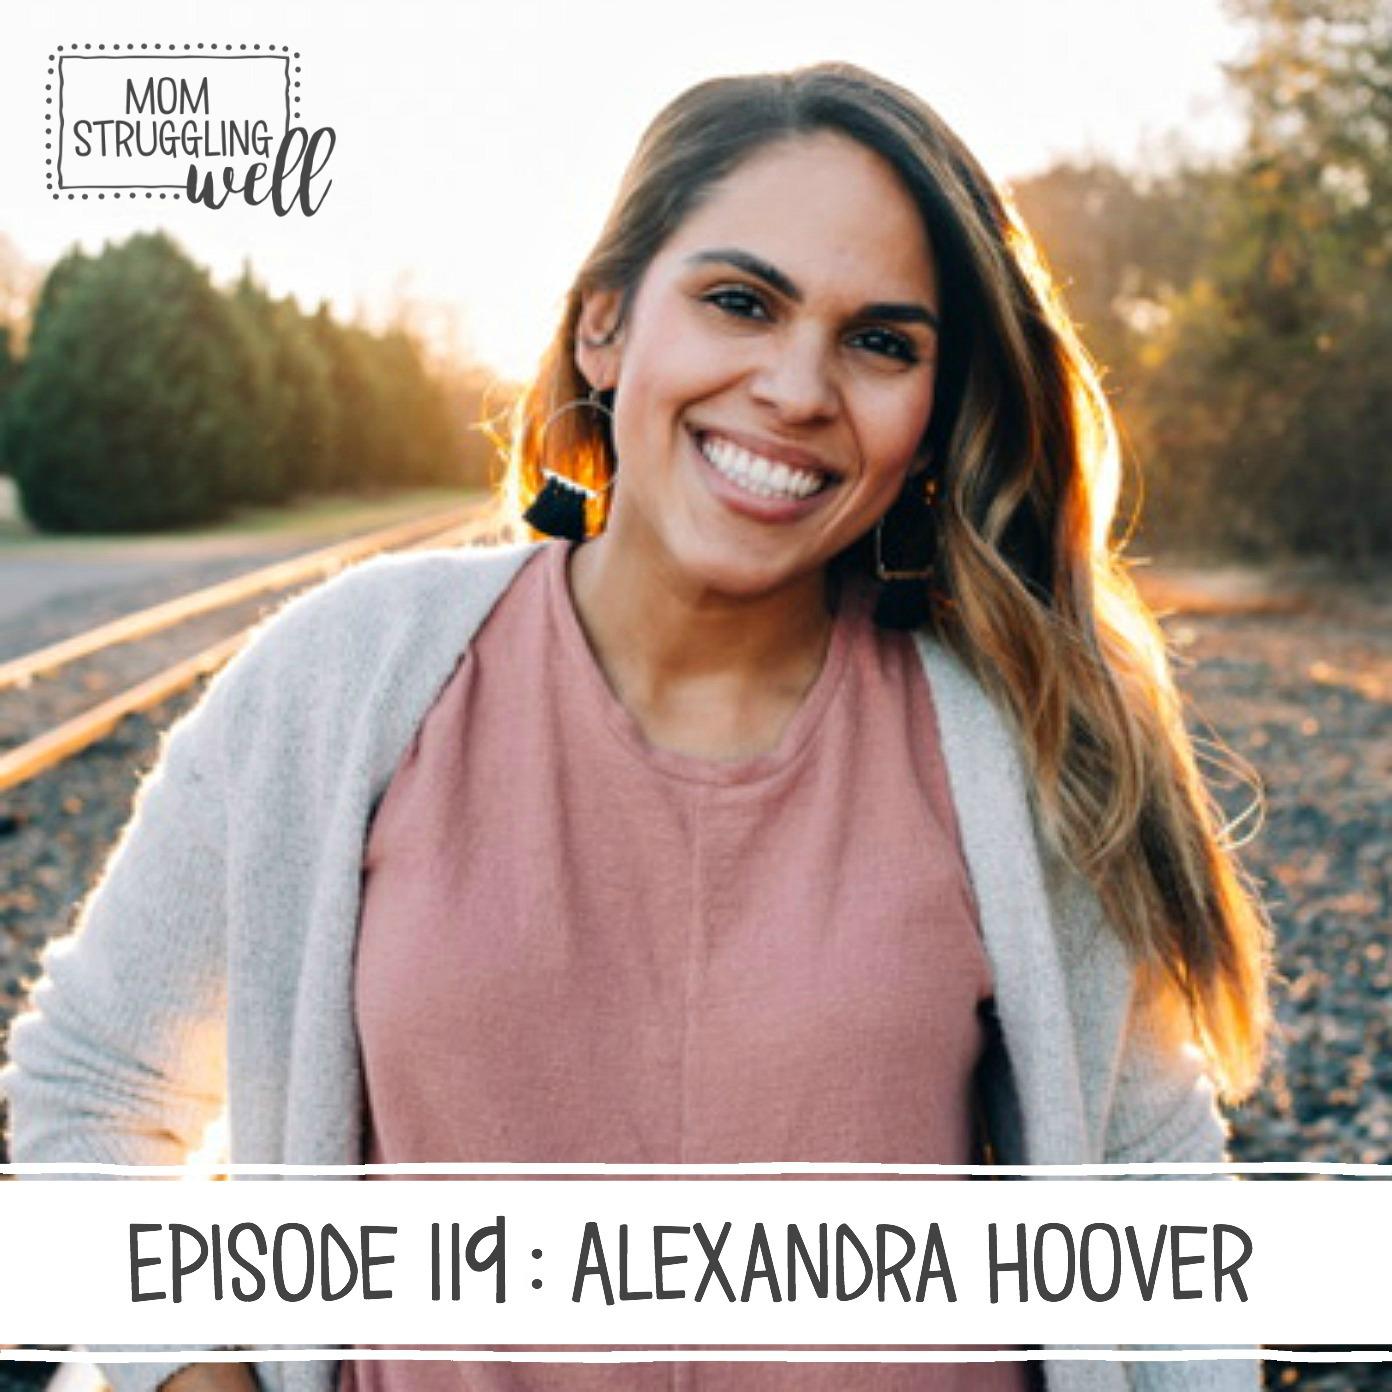 Alex Hoover